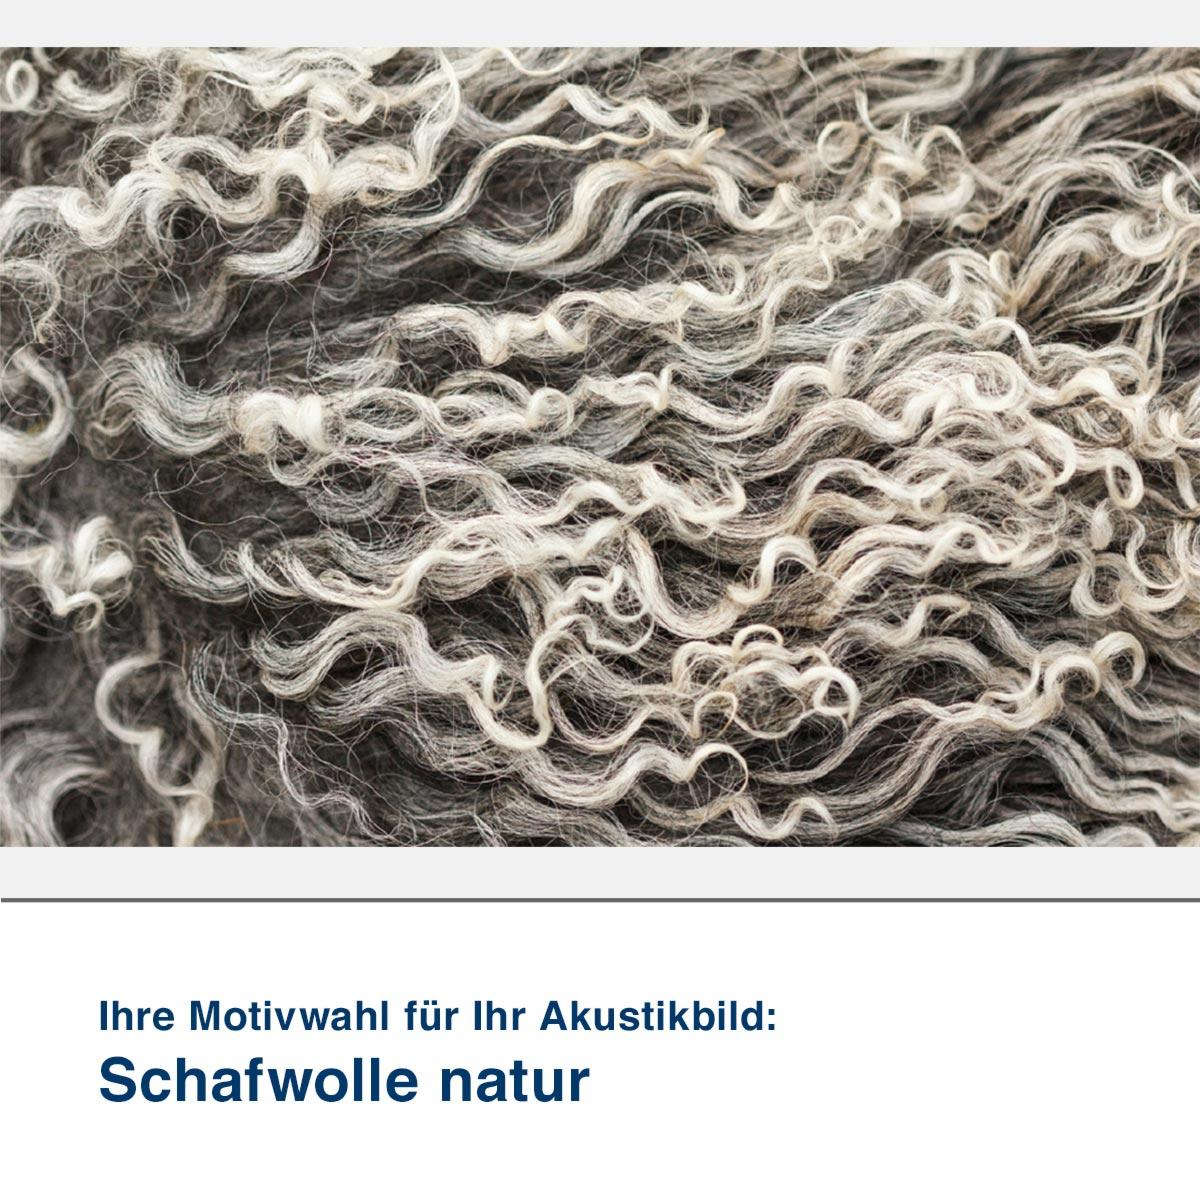 Akustikbild Motiv Schafwolle natur